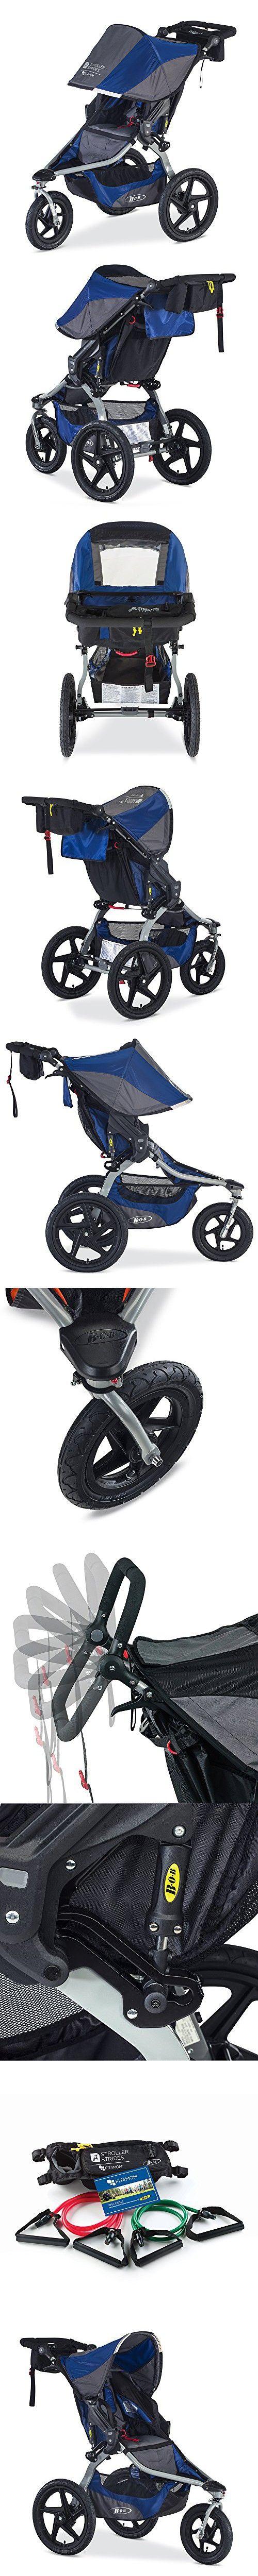 BOB 2016 Strides Fitness Stroller, Blue